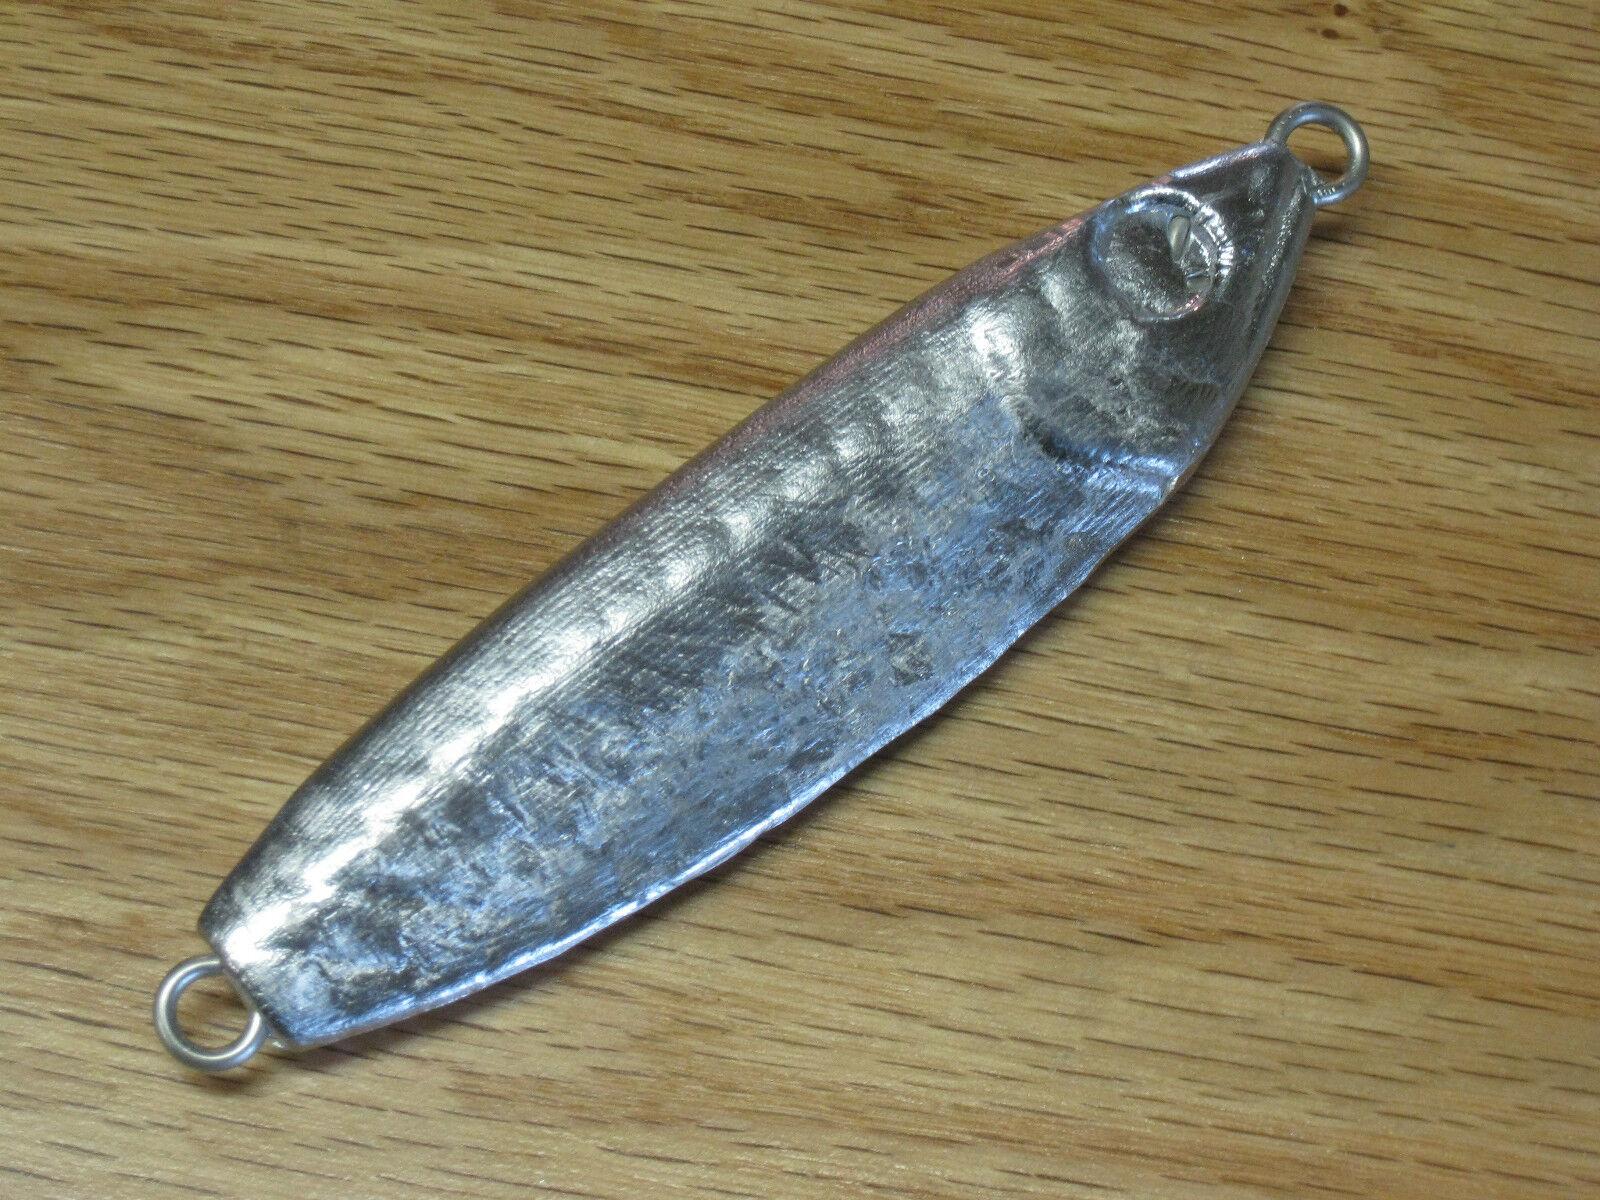 Striper Fishing saltwater lures Parachute Jig// 8 oz